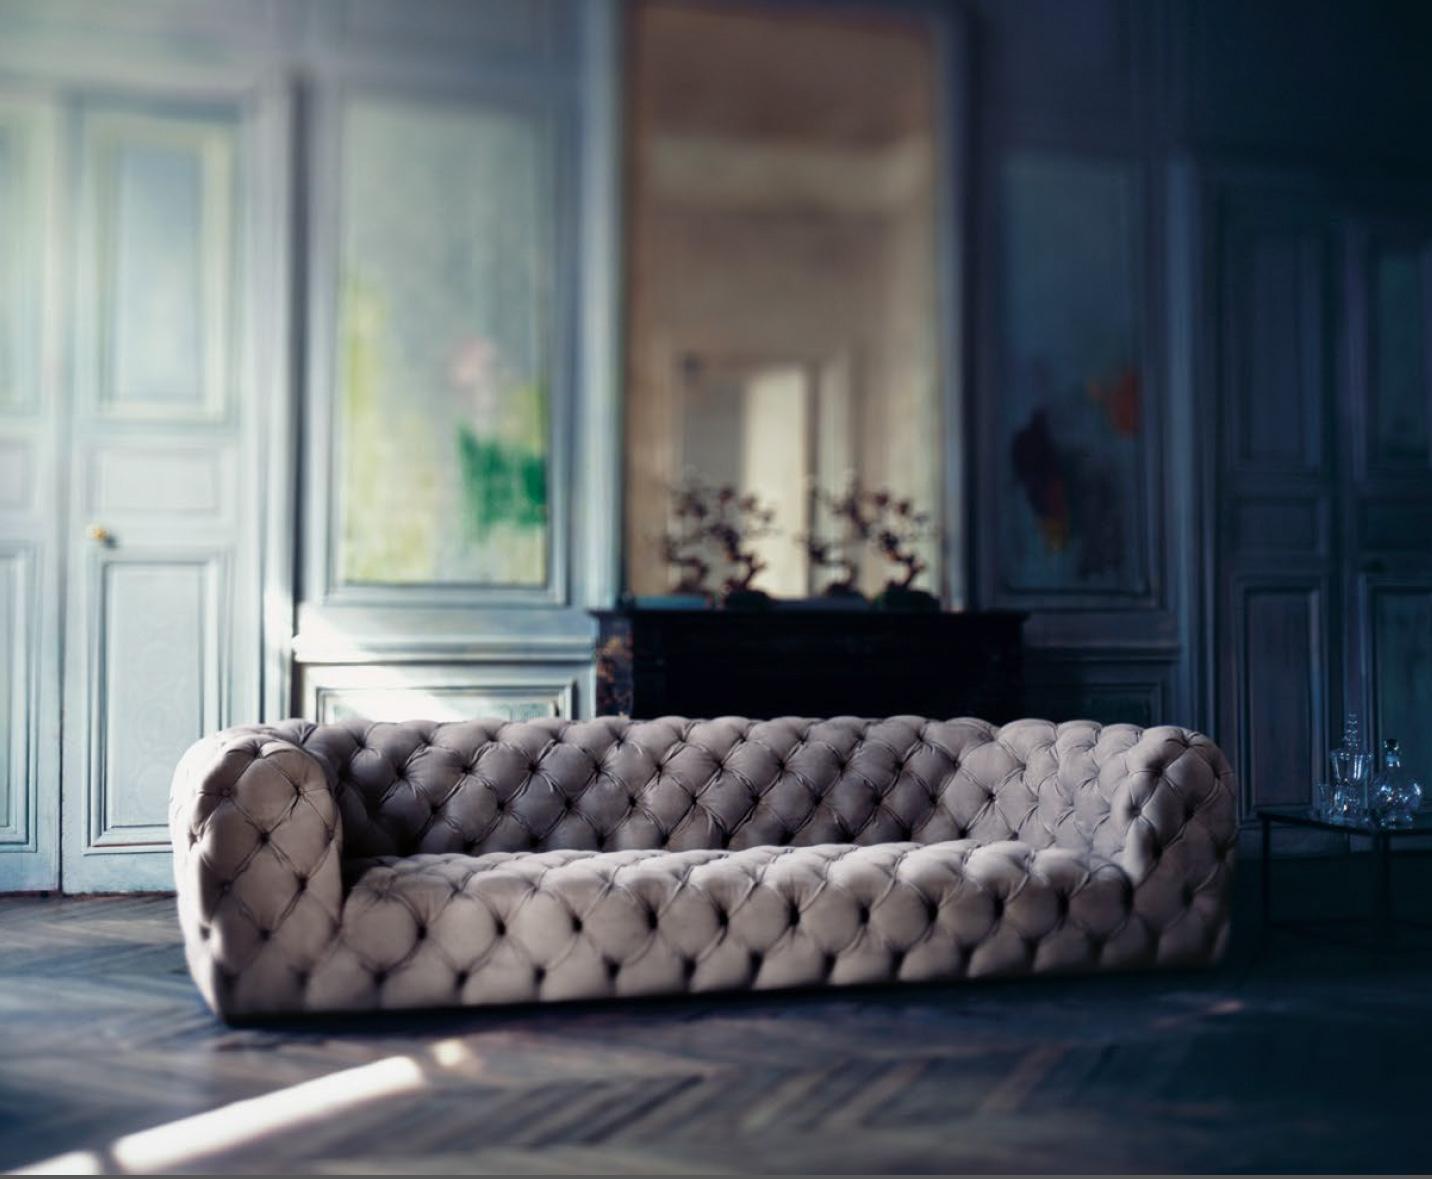 Full Size of Baxter Sofa Criteria Collection Furniture Italia Chester Moon Big Leder Ligne Roset Ebay Stilecht Kare In L Form Rattan Muuto Groß Marken U Xxl 2 Sitzer Mit Sofa Baxter Sofa